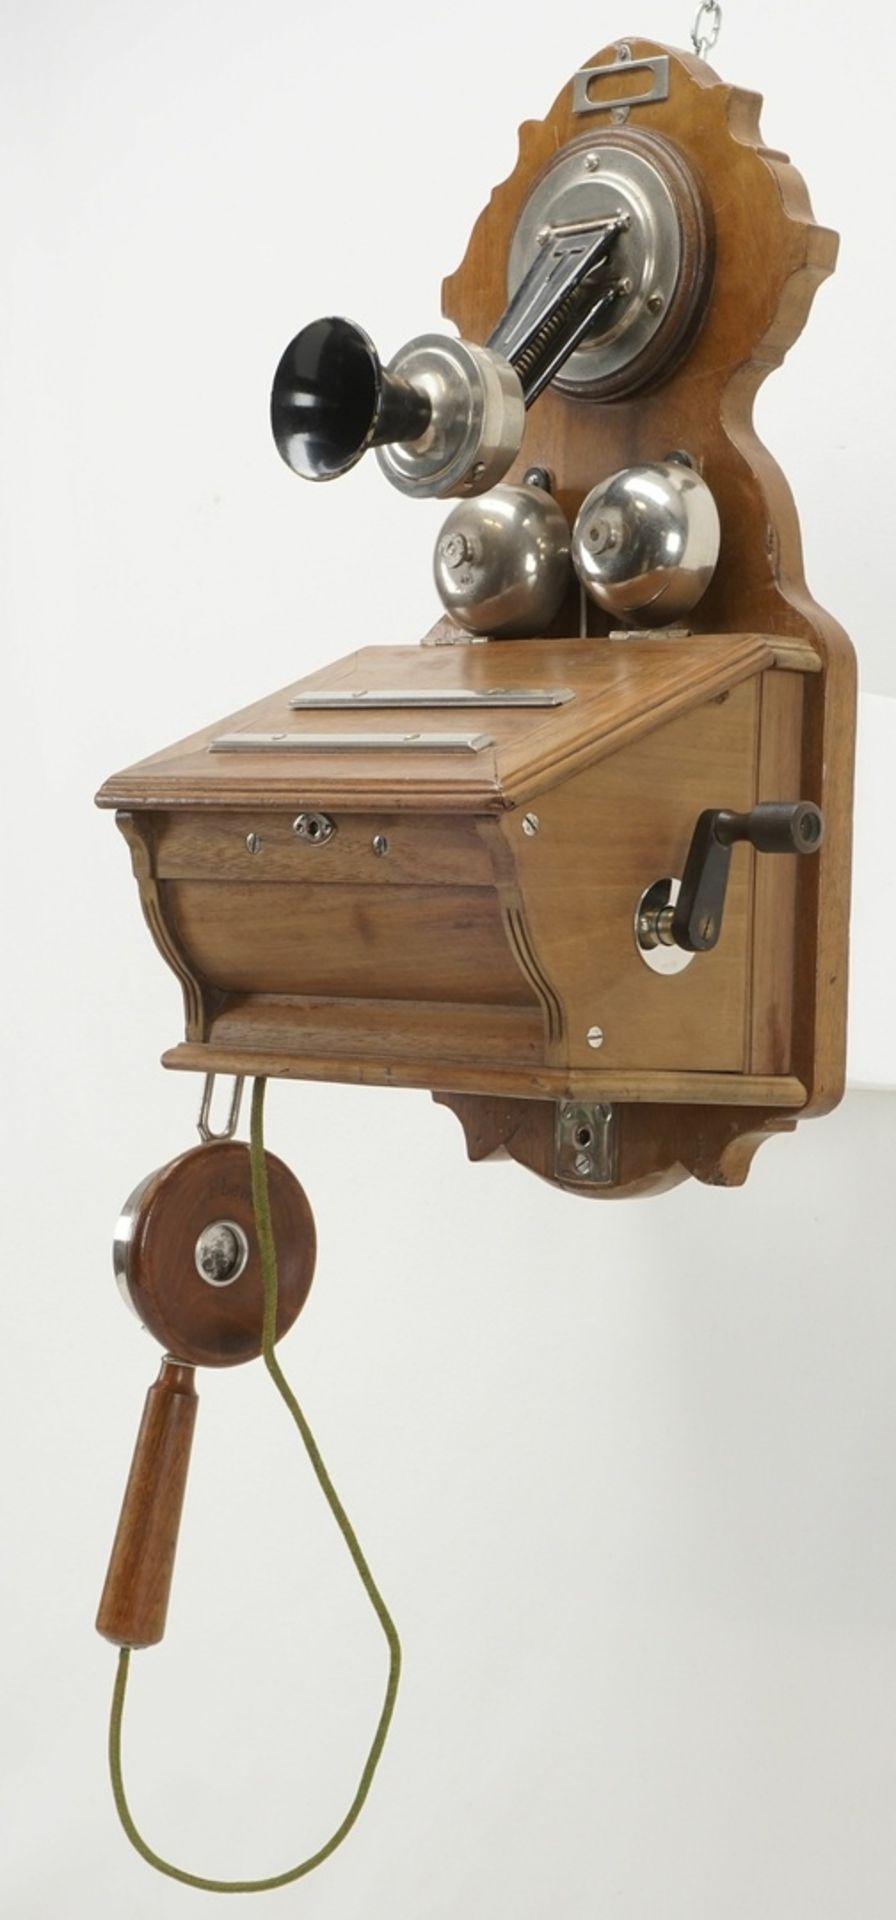 F. Schuchhardt Wandtelefon OB 04, um 1900 - Bild 2 aus 5